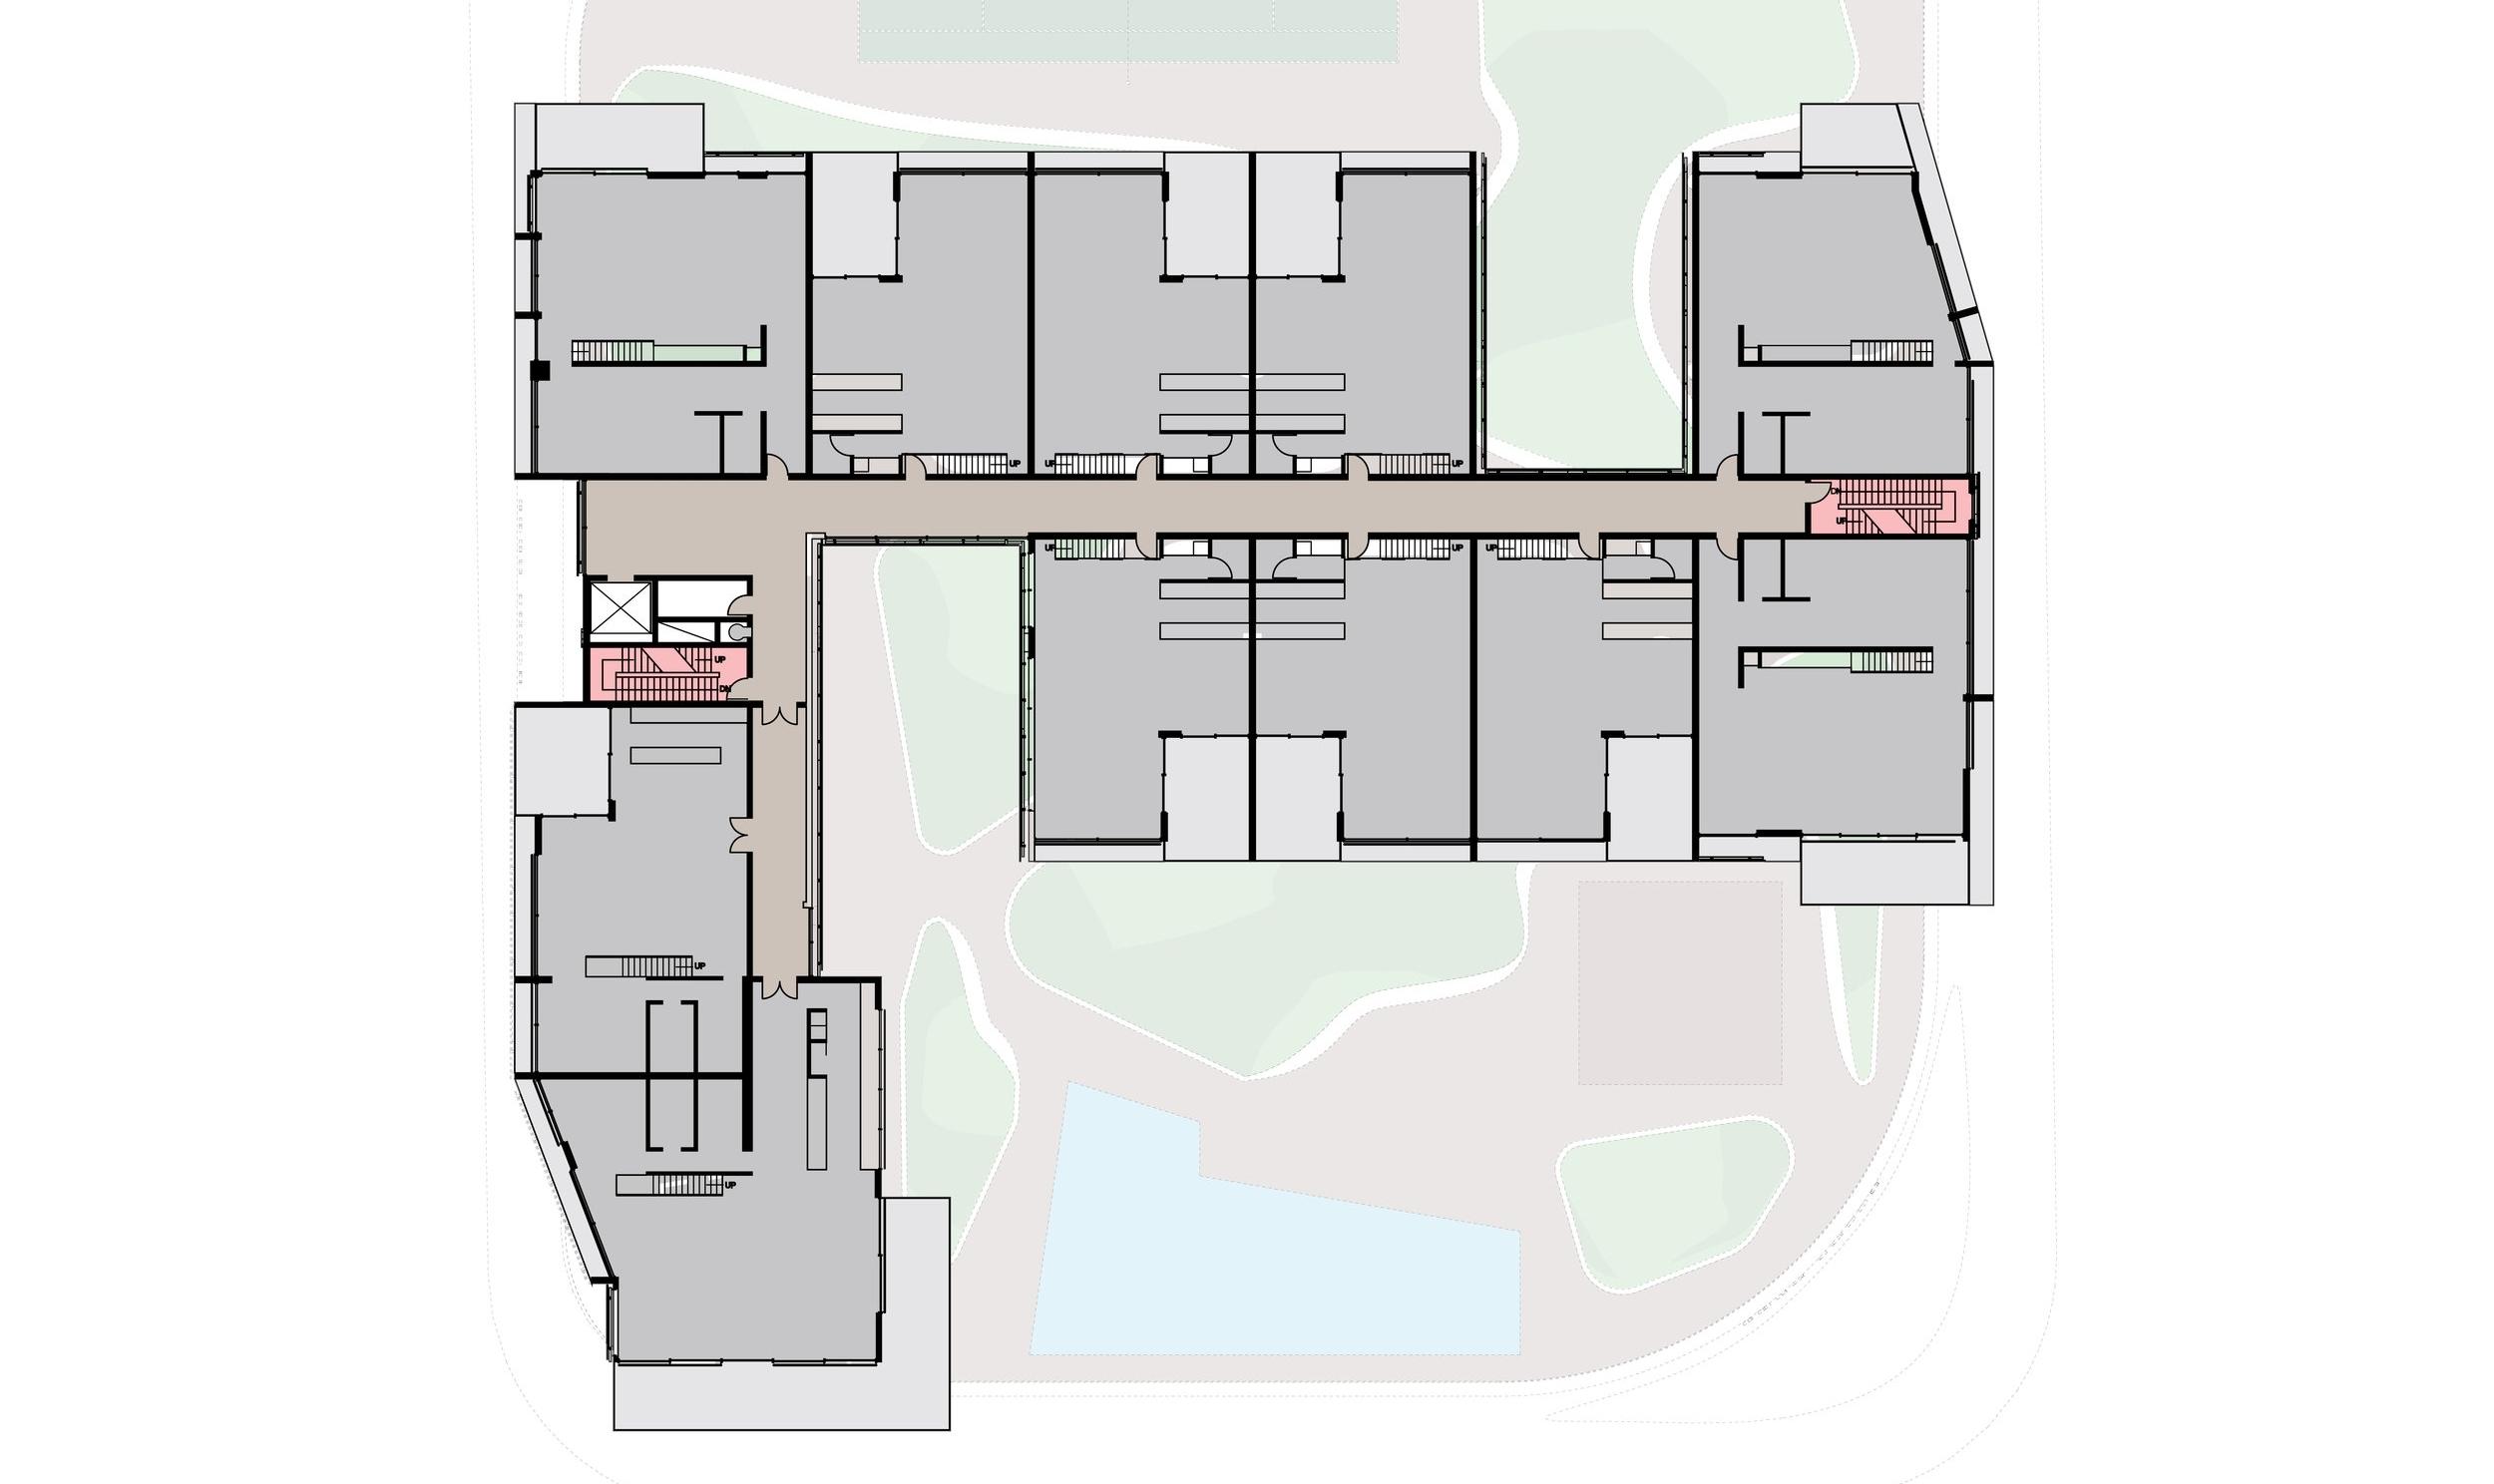 plan lvl 3.jpg